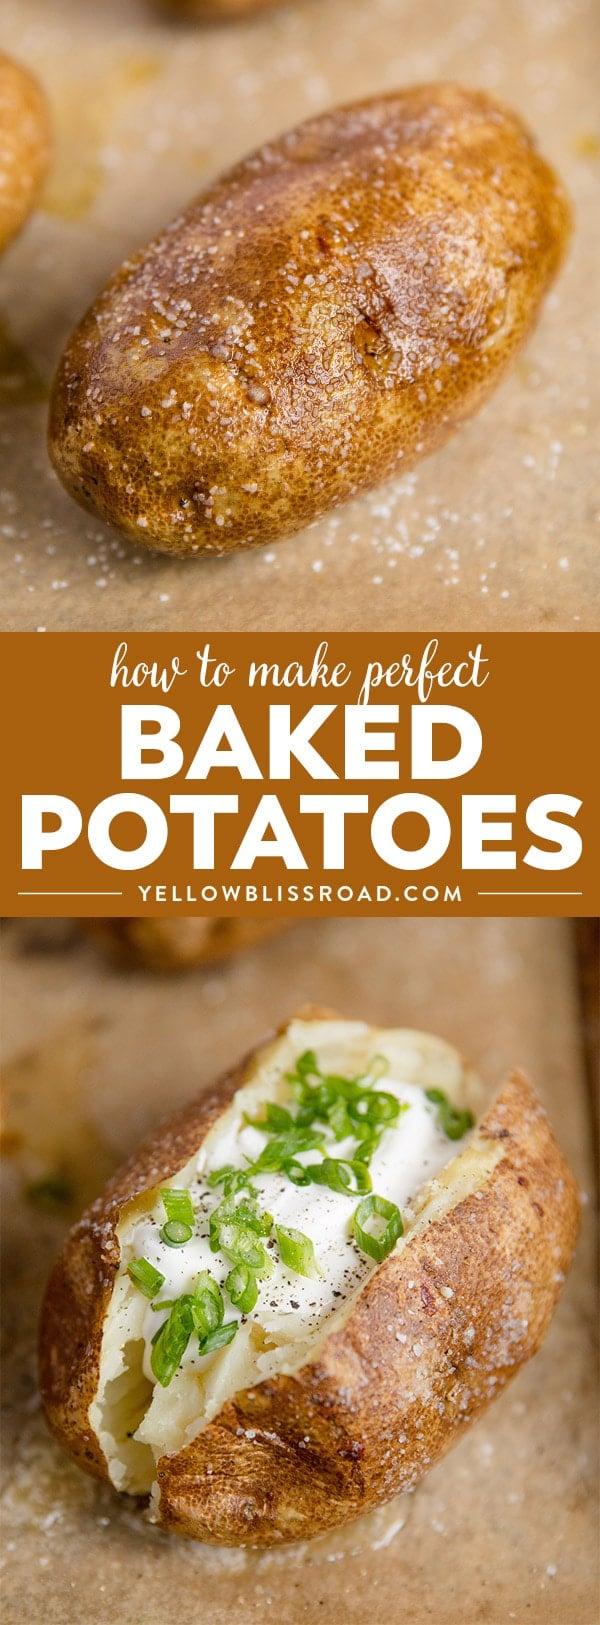 Social media image of baked potatoes